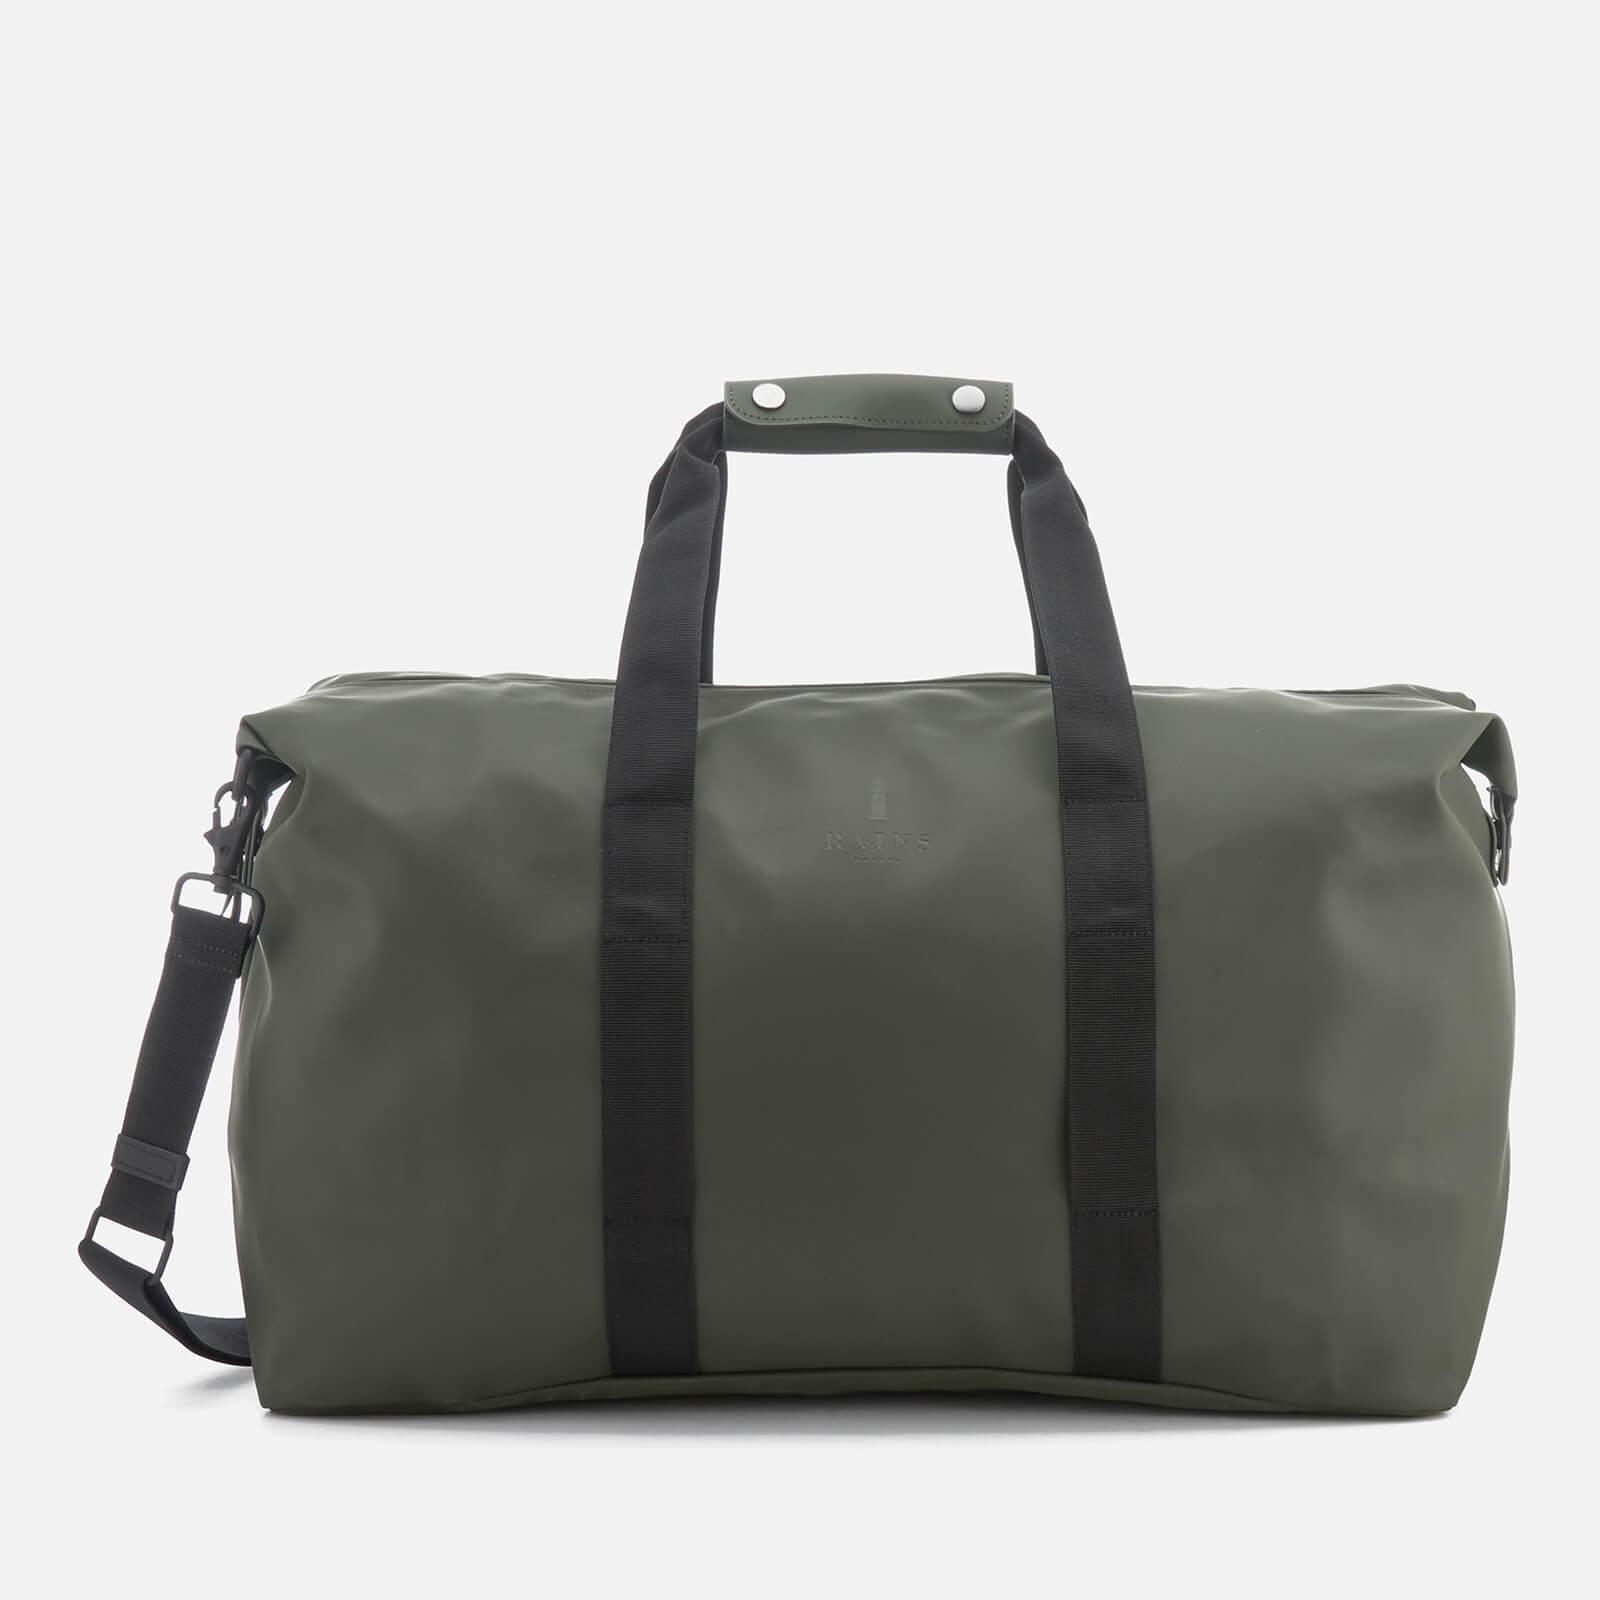 Rains Weekend Bag - Green